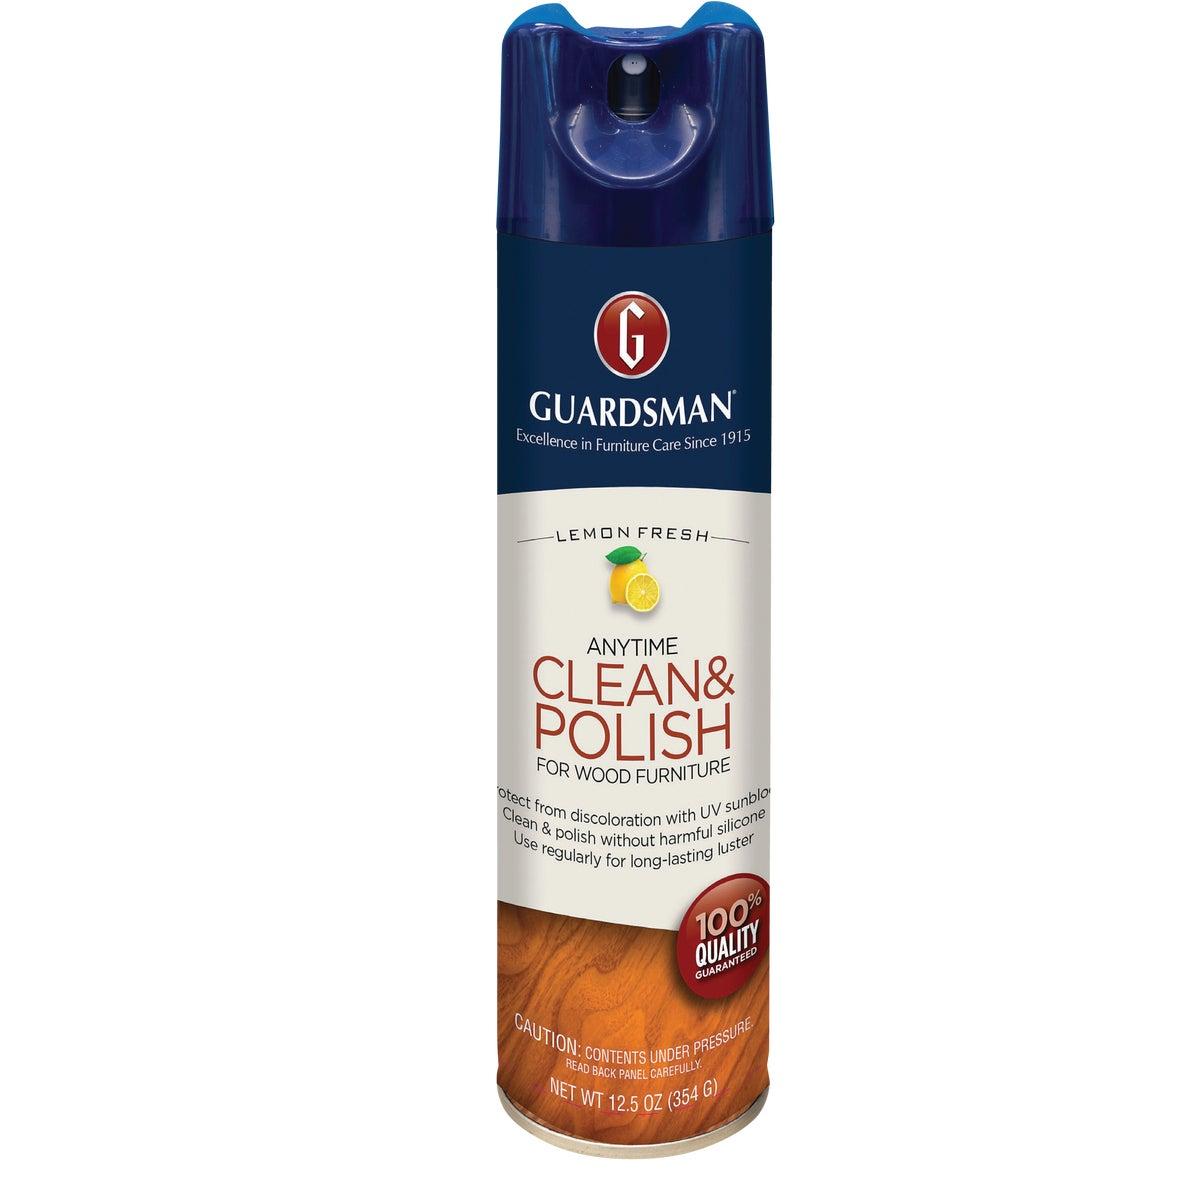 12.5OZ LMN CLEAN&POLISH - 460300 by Valspar  Guardsman